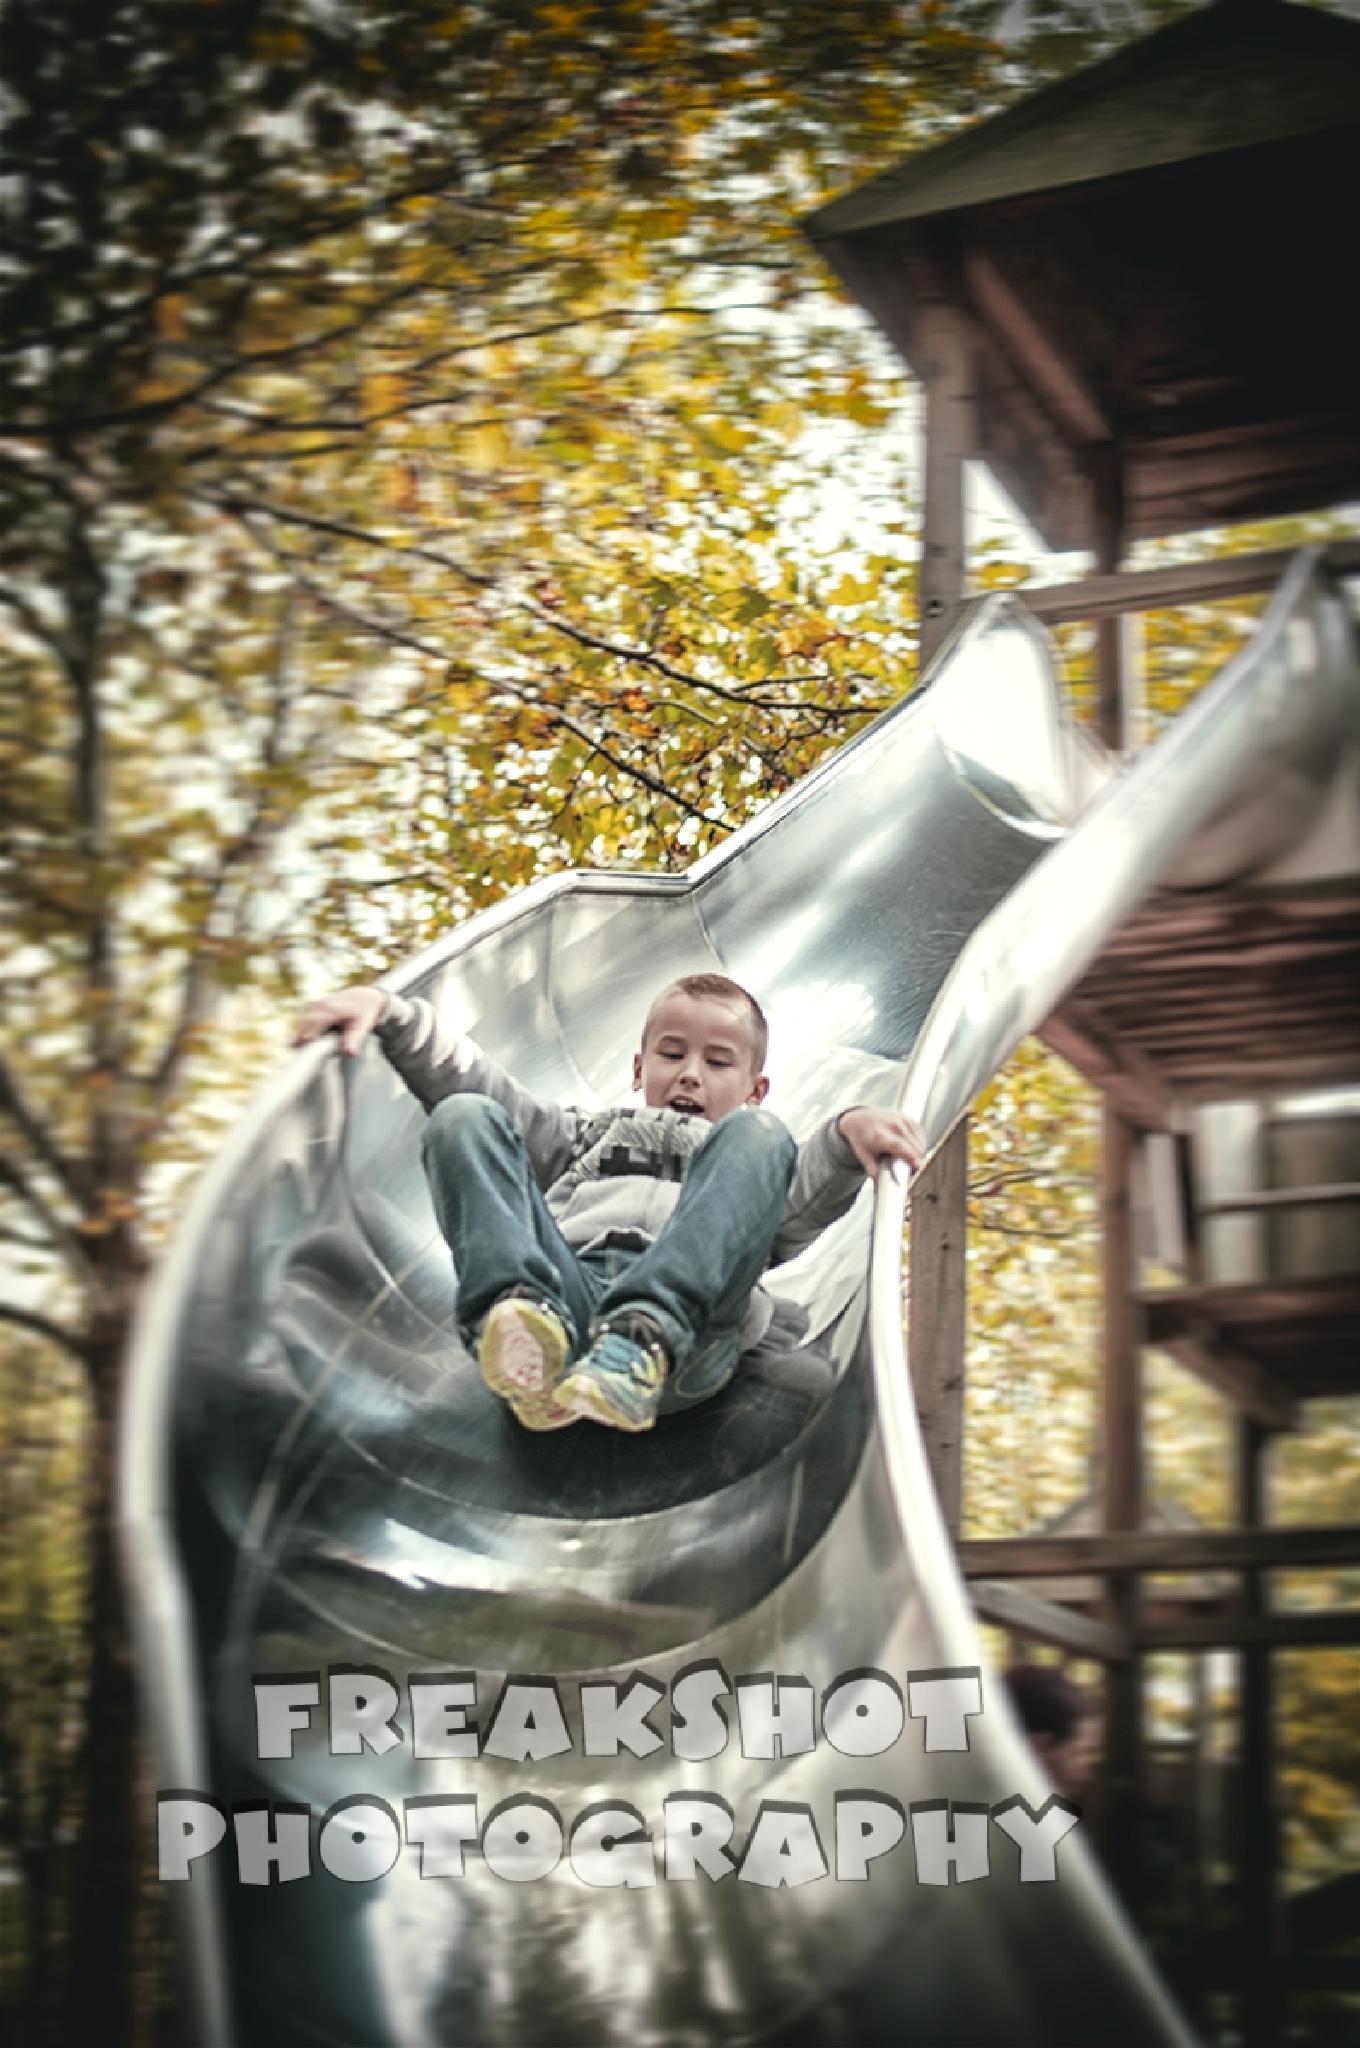 slide by FreakshotPhotography